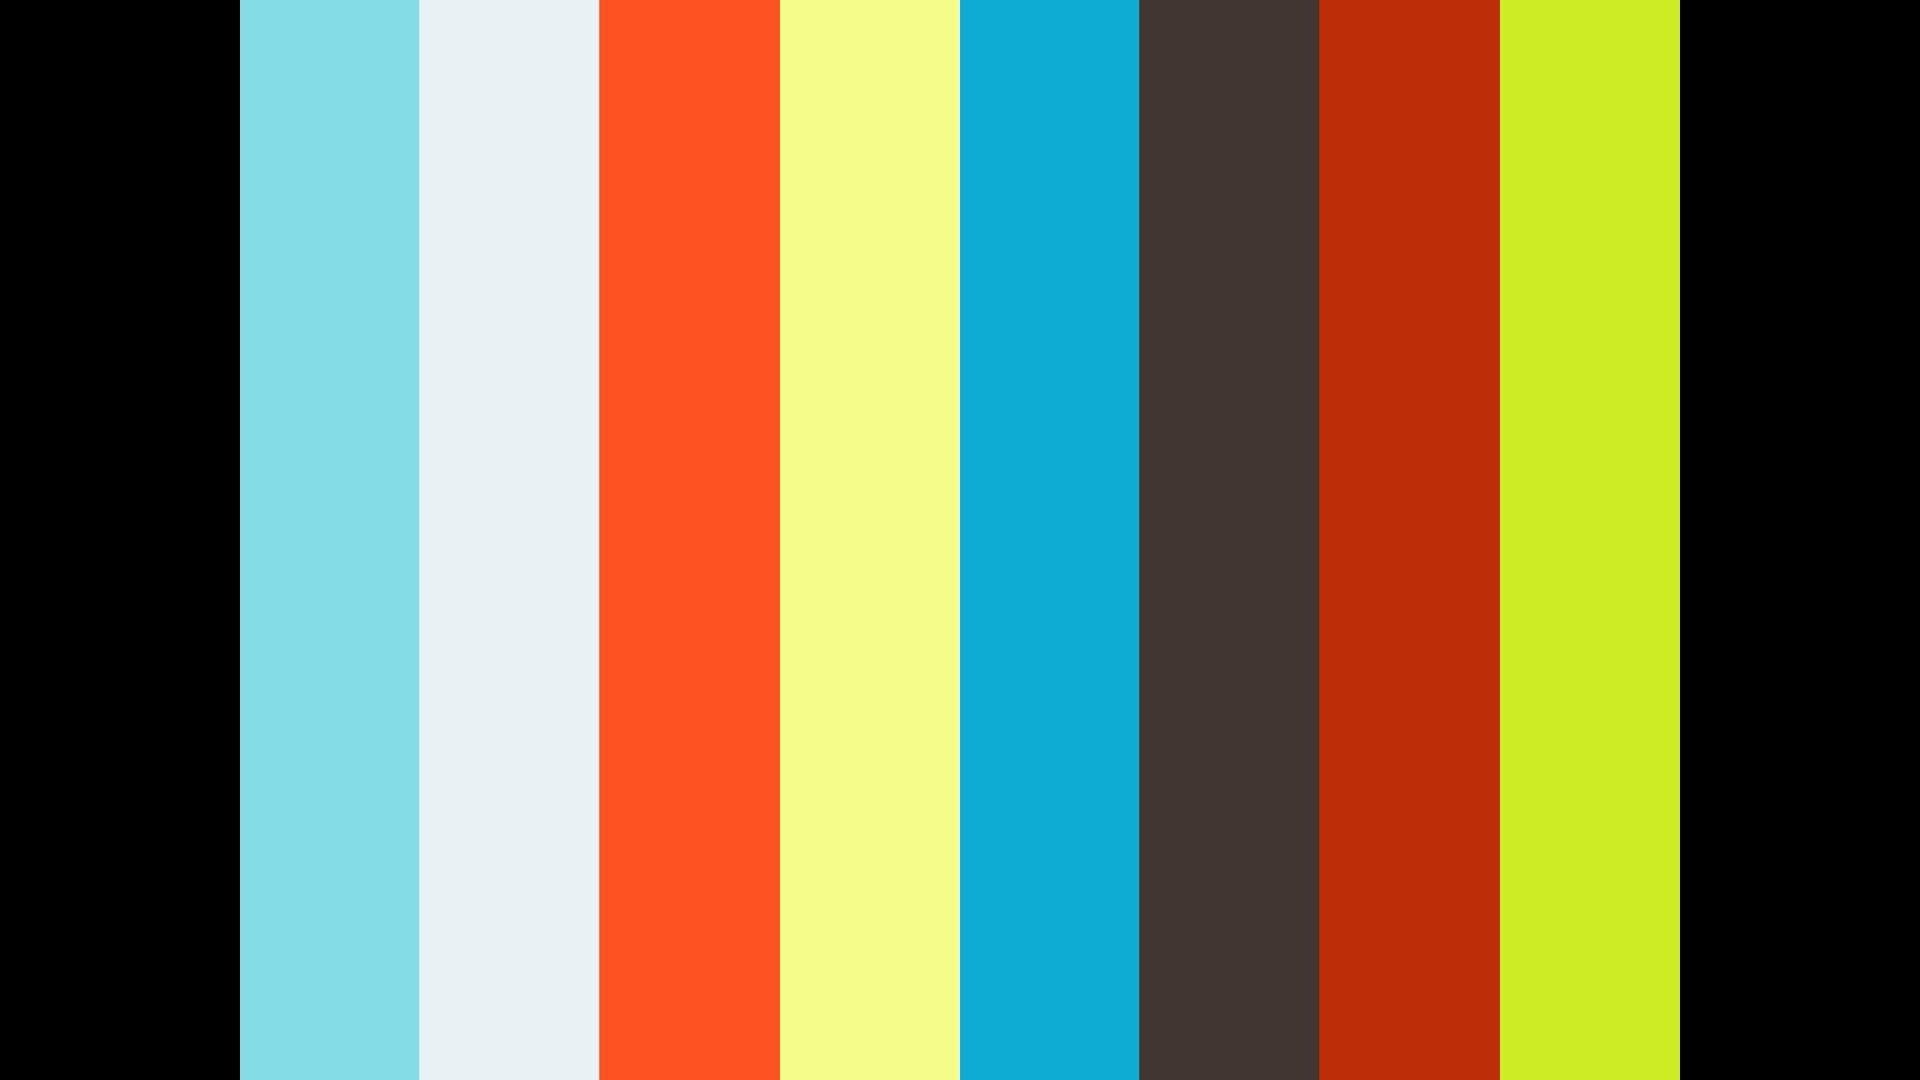 Arbeitsblätter erstellen   bettermarks   Adaptives Lernsystem für